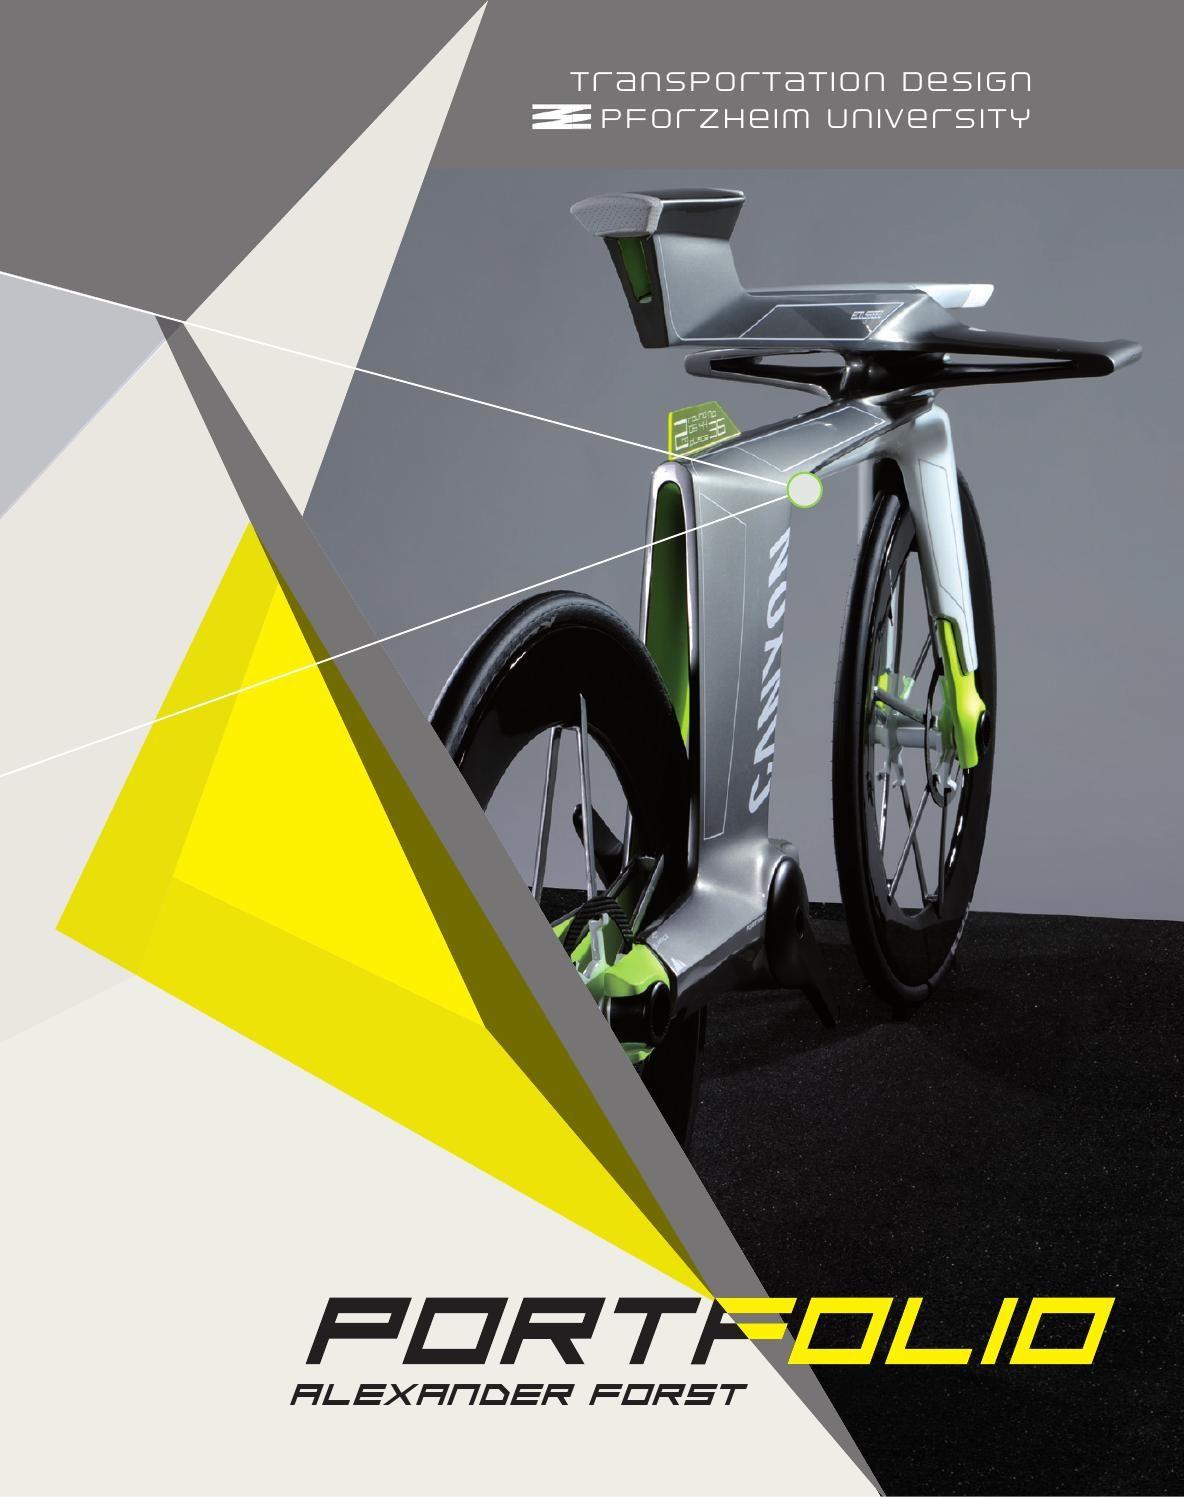 Portfolio Alexander Forst  Transportation Design HS Pforzheim